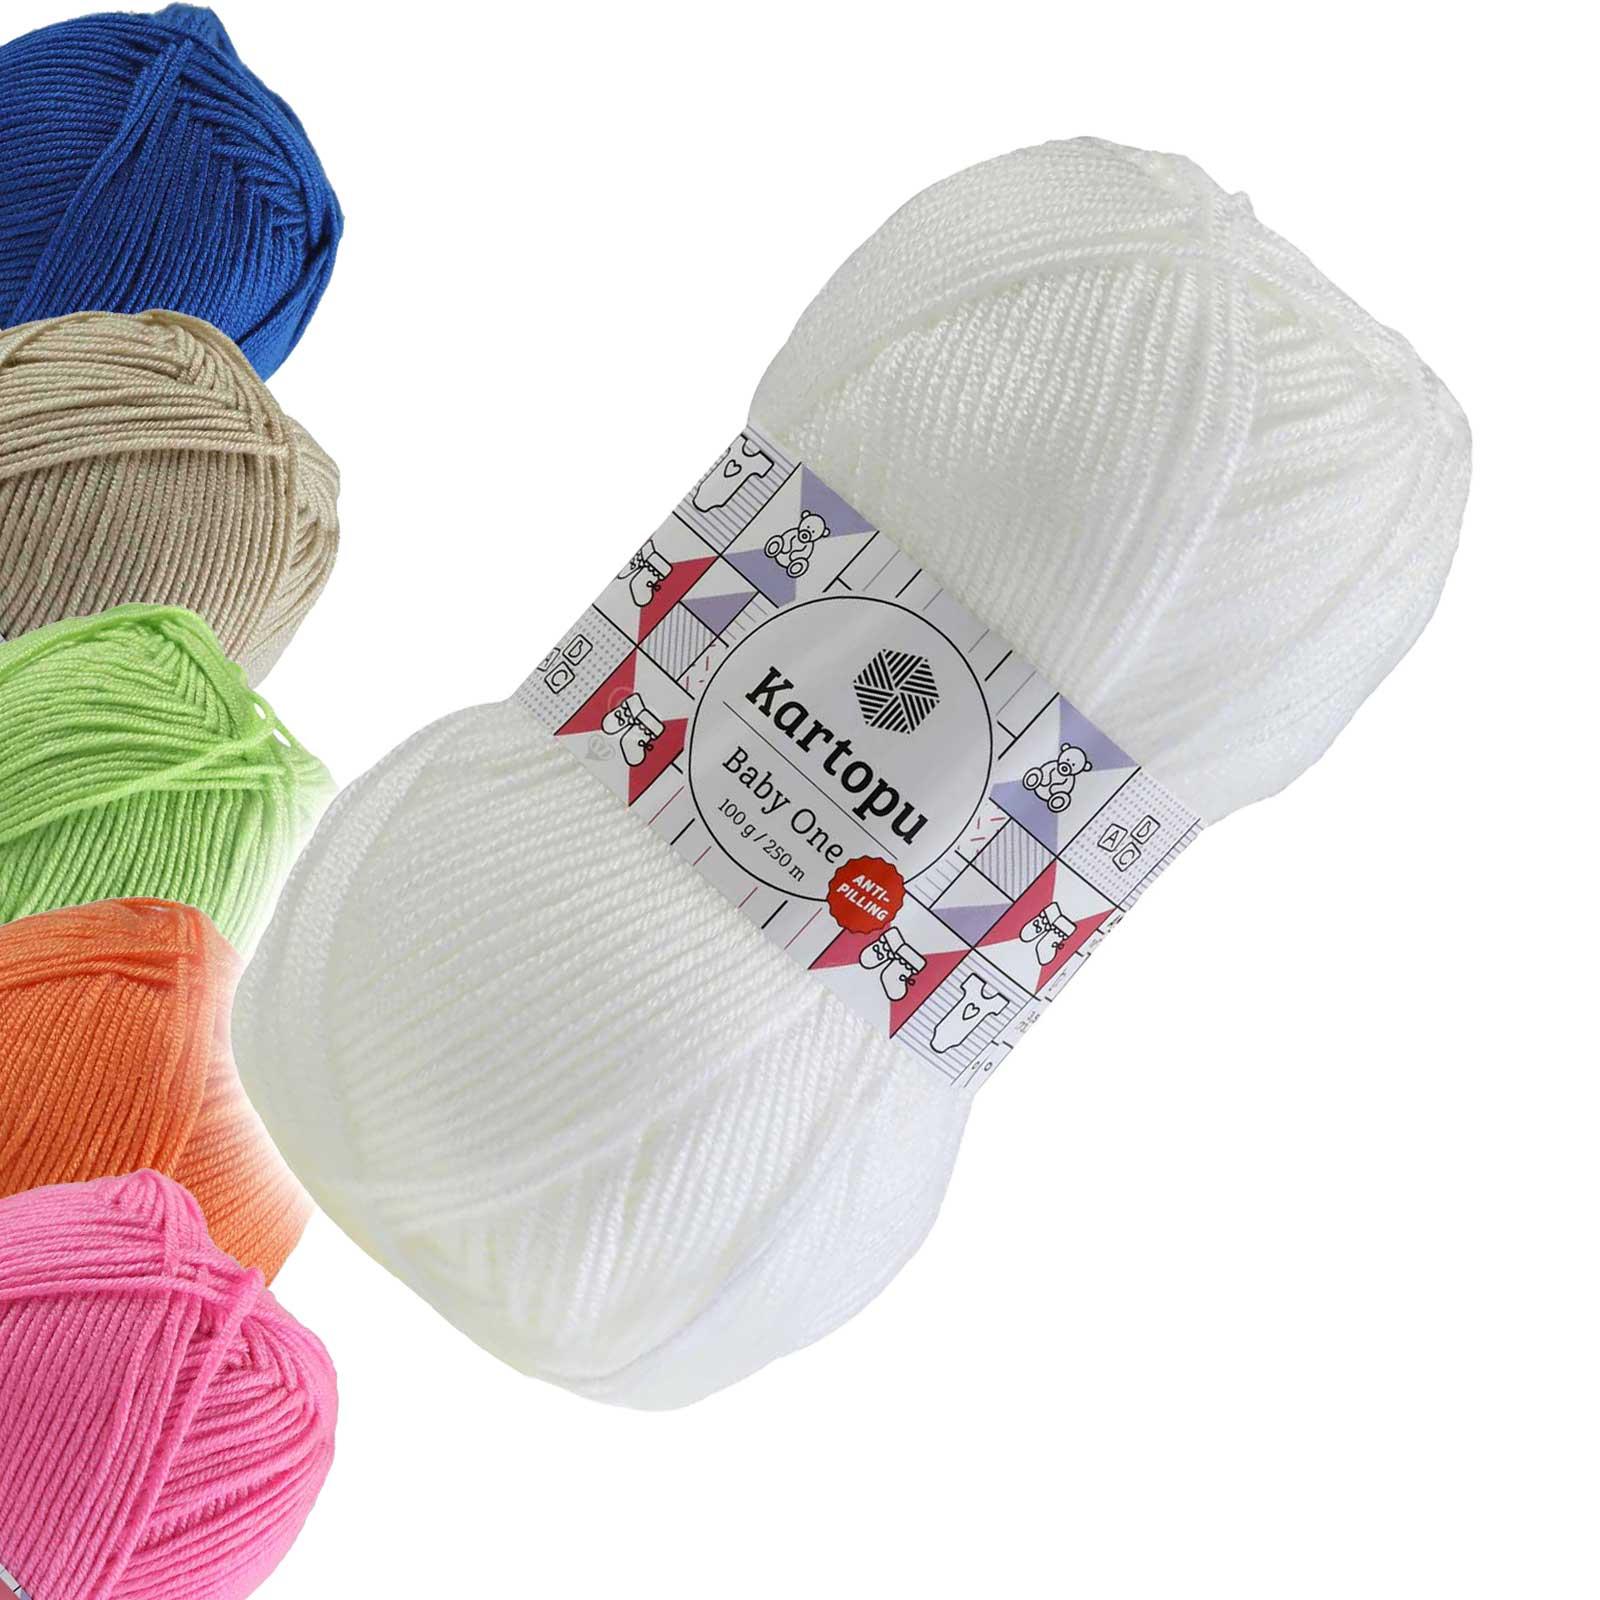 100g Strickgarn Kartopu BABY ONE Antipilling Babywolle Babystrickgarn, Farbwahl – Bild 3